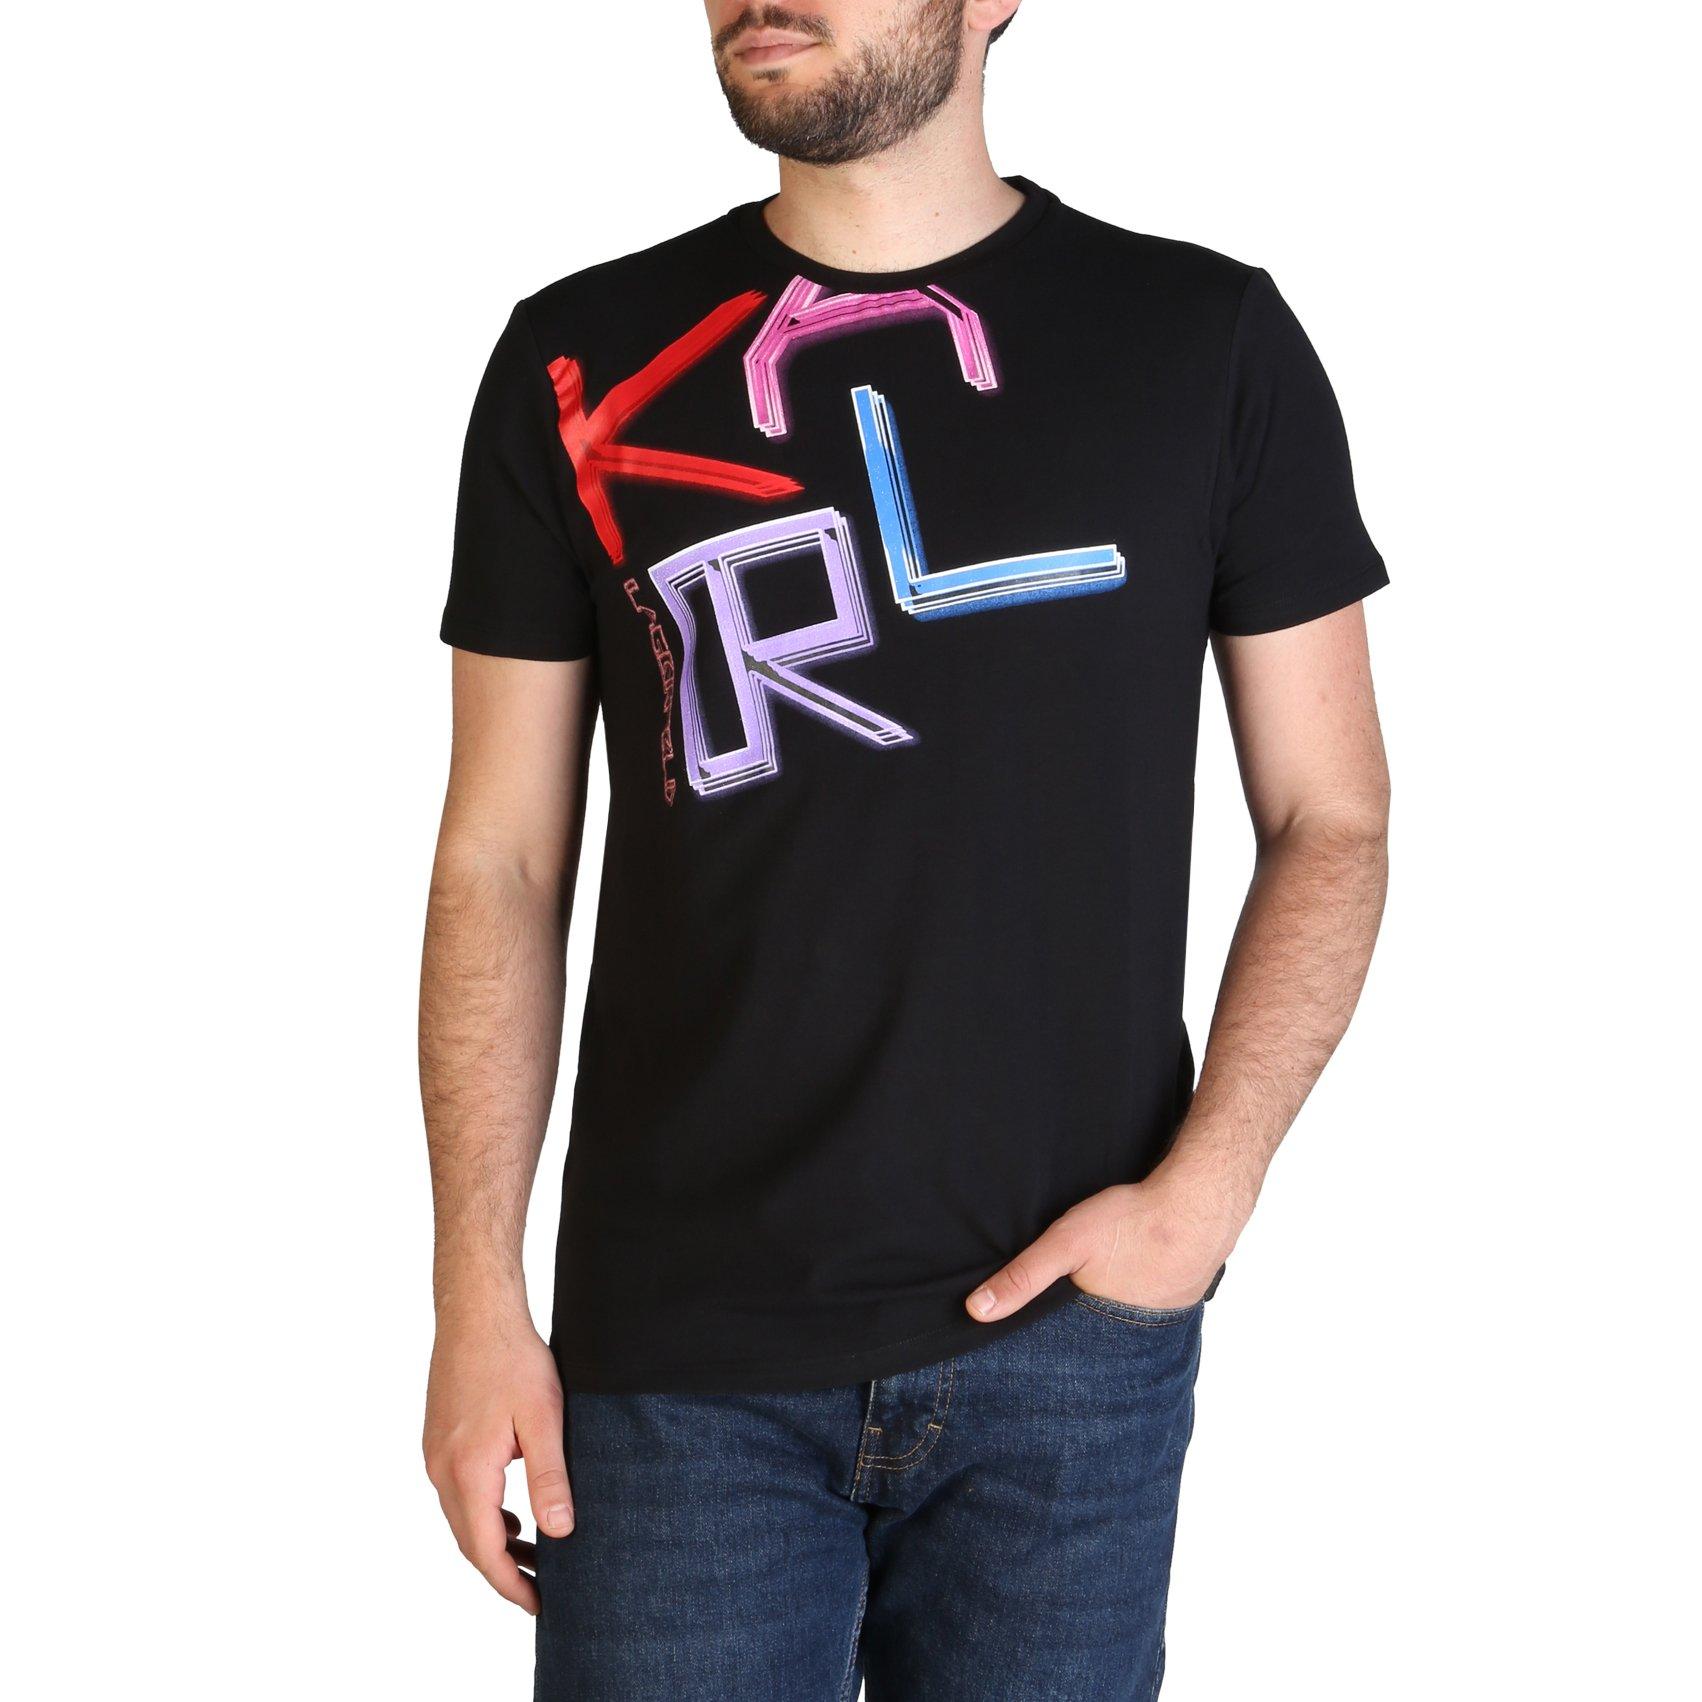 Karl Lagerfeld Men's T-Shirt Various Colours KL21MTS02 - black L